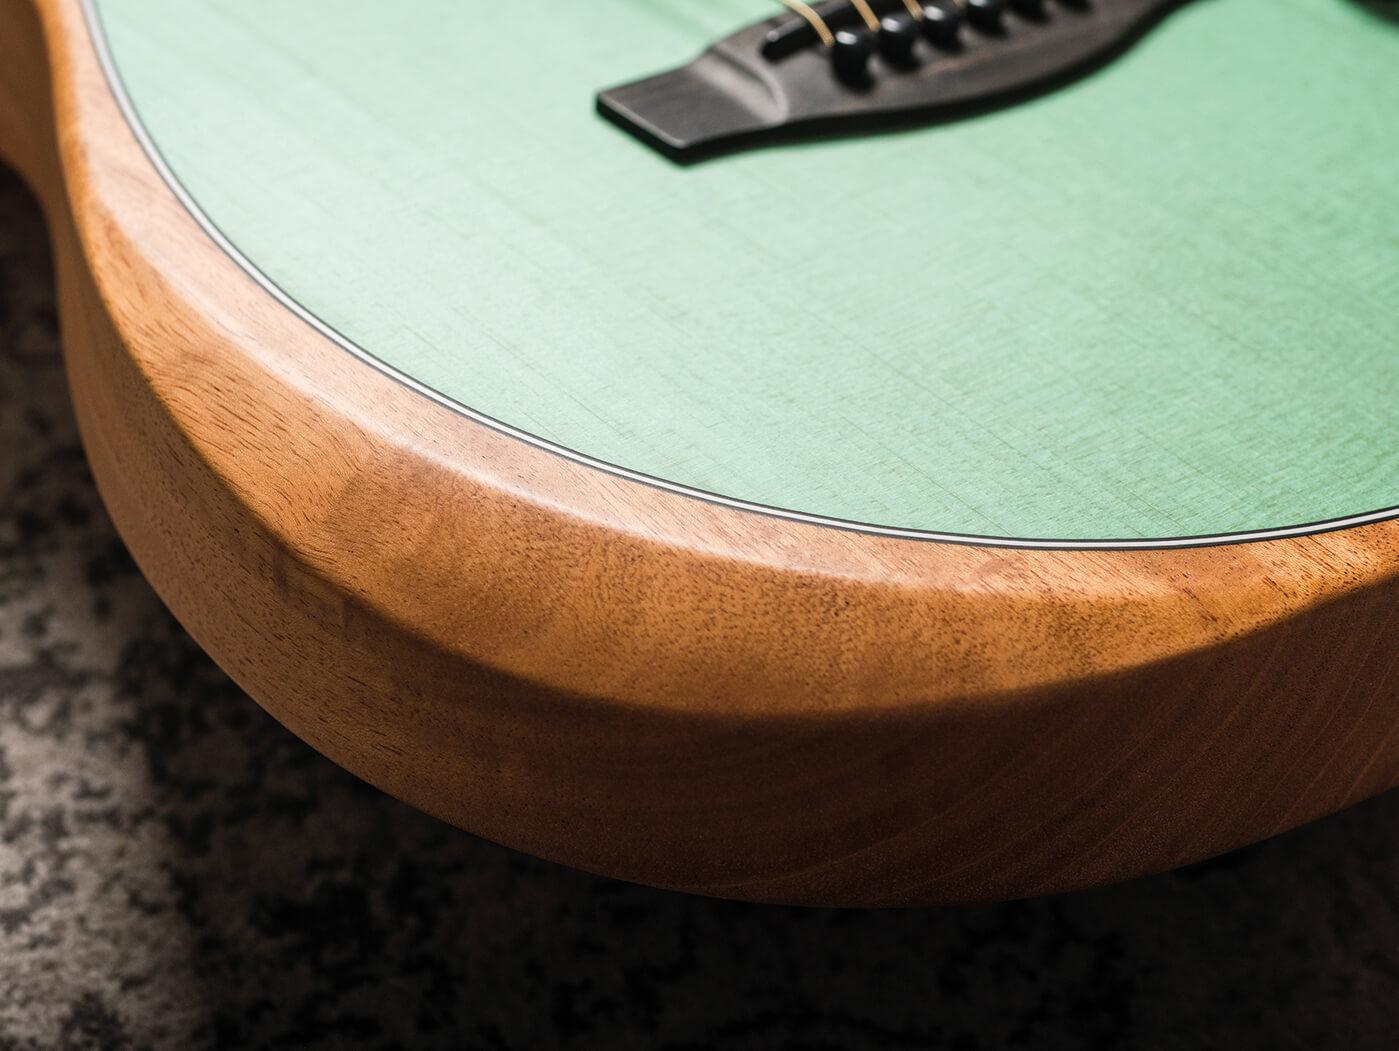 Fender American Acoustasonic contour